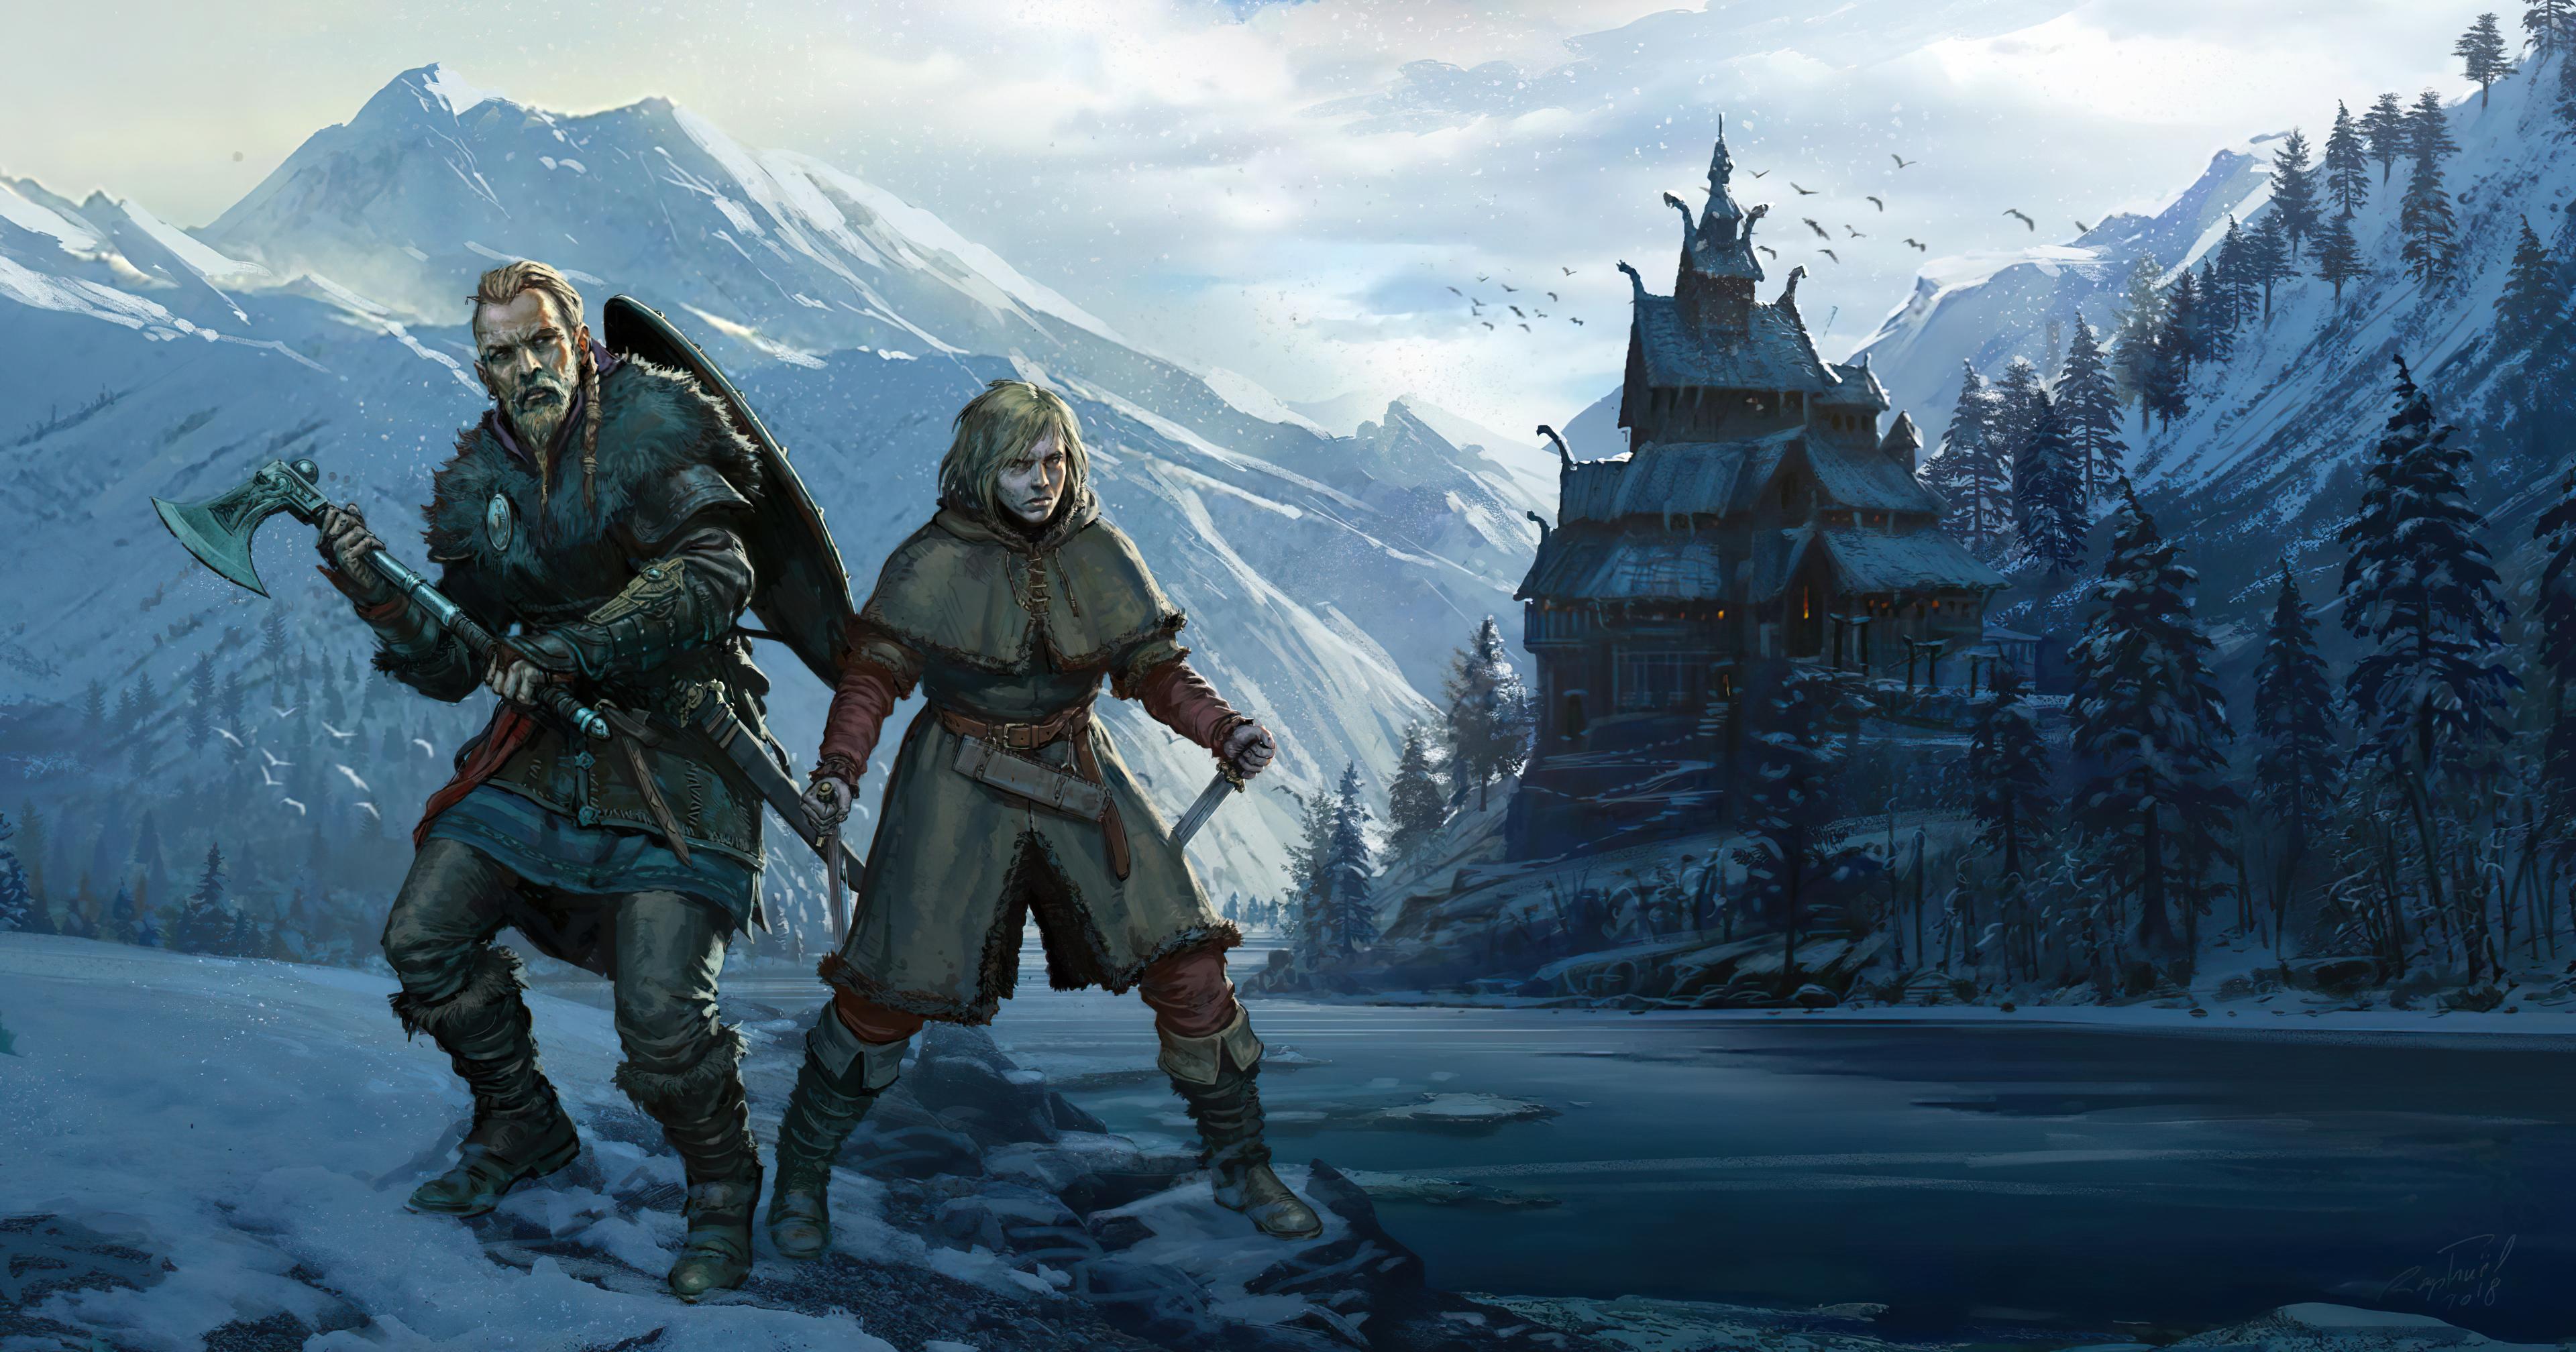 Vinland Saga Assassins Creed Valhalla Wallpaper, HD Games ...